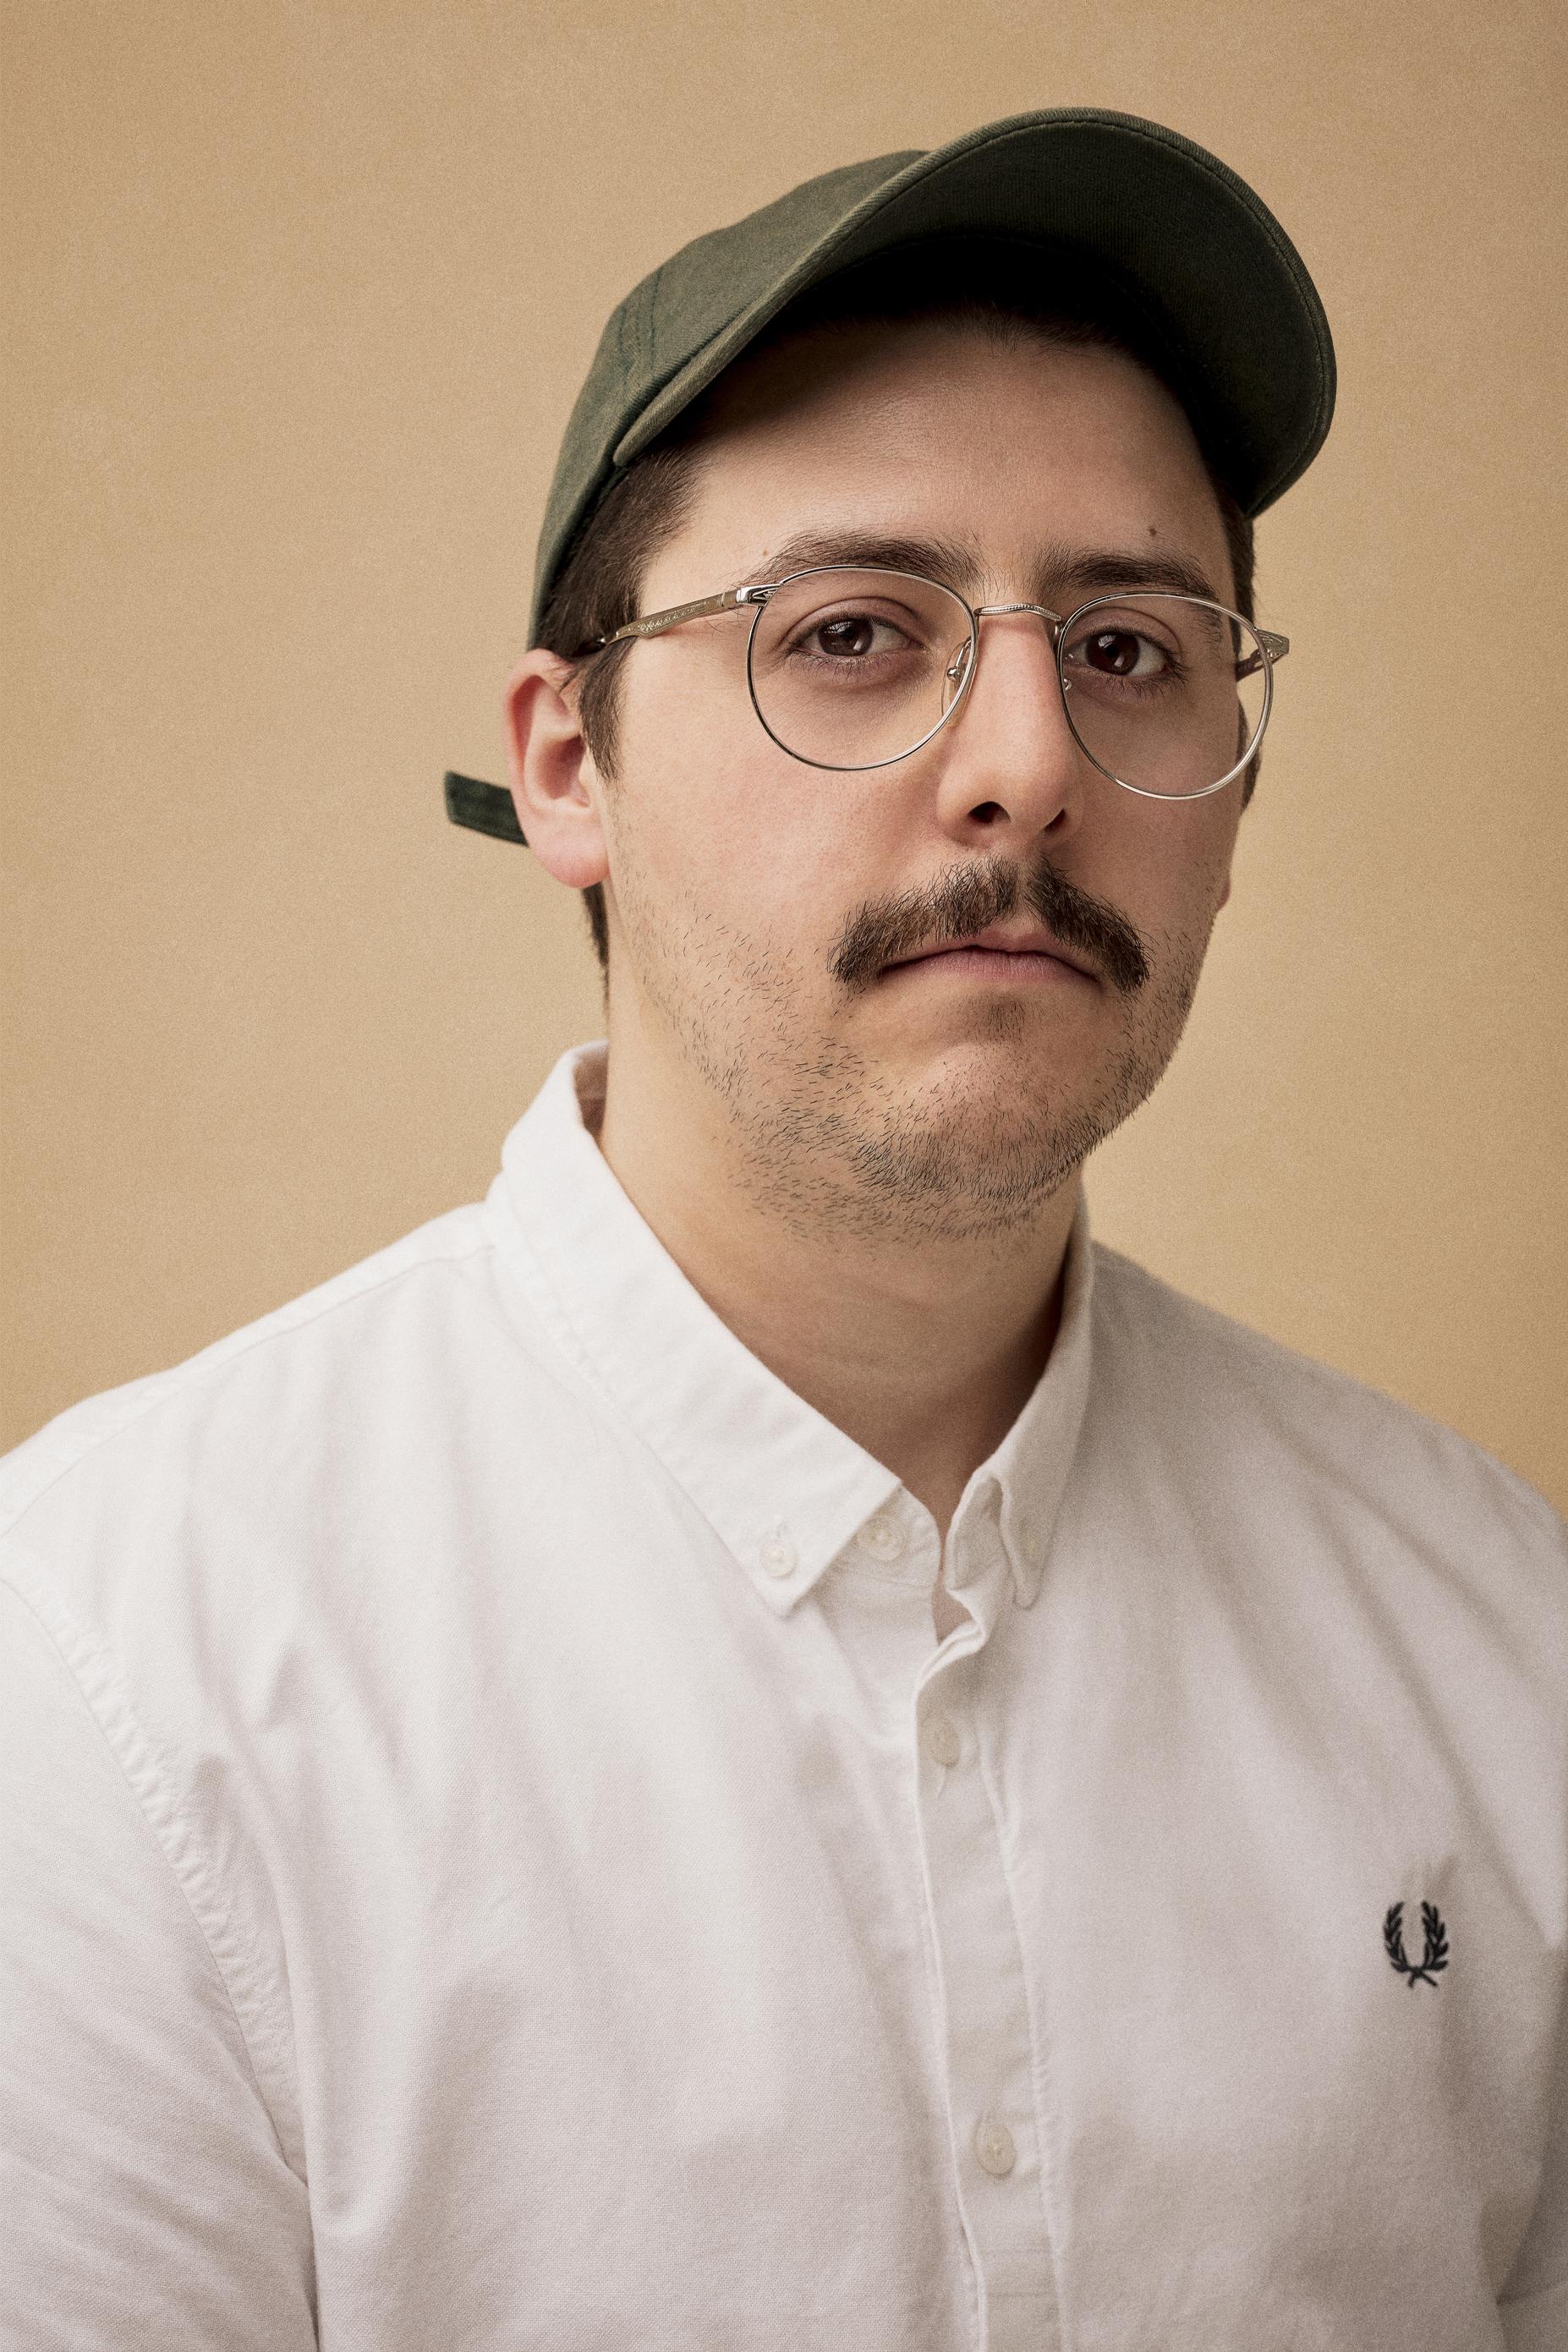 BillyClub_Portraits_01-1.jpg